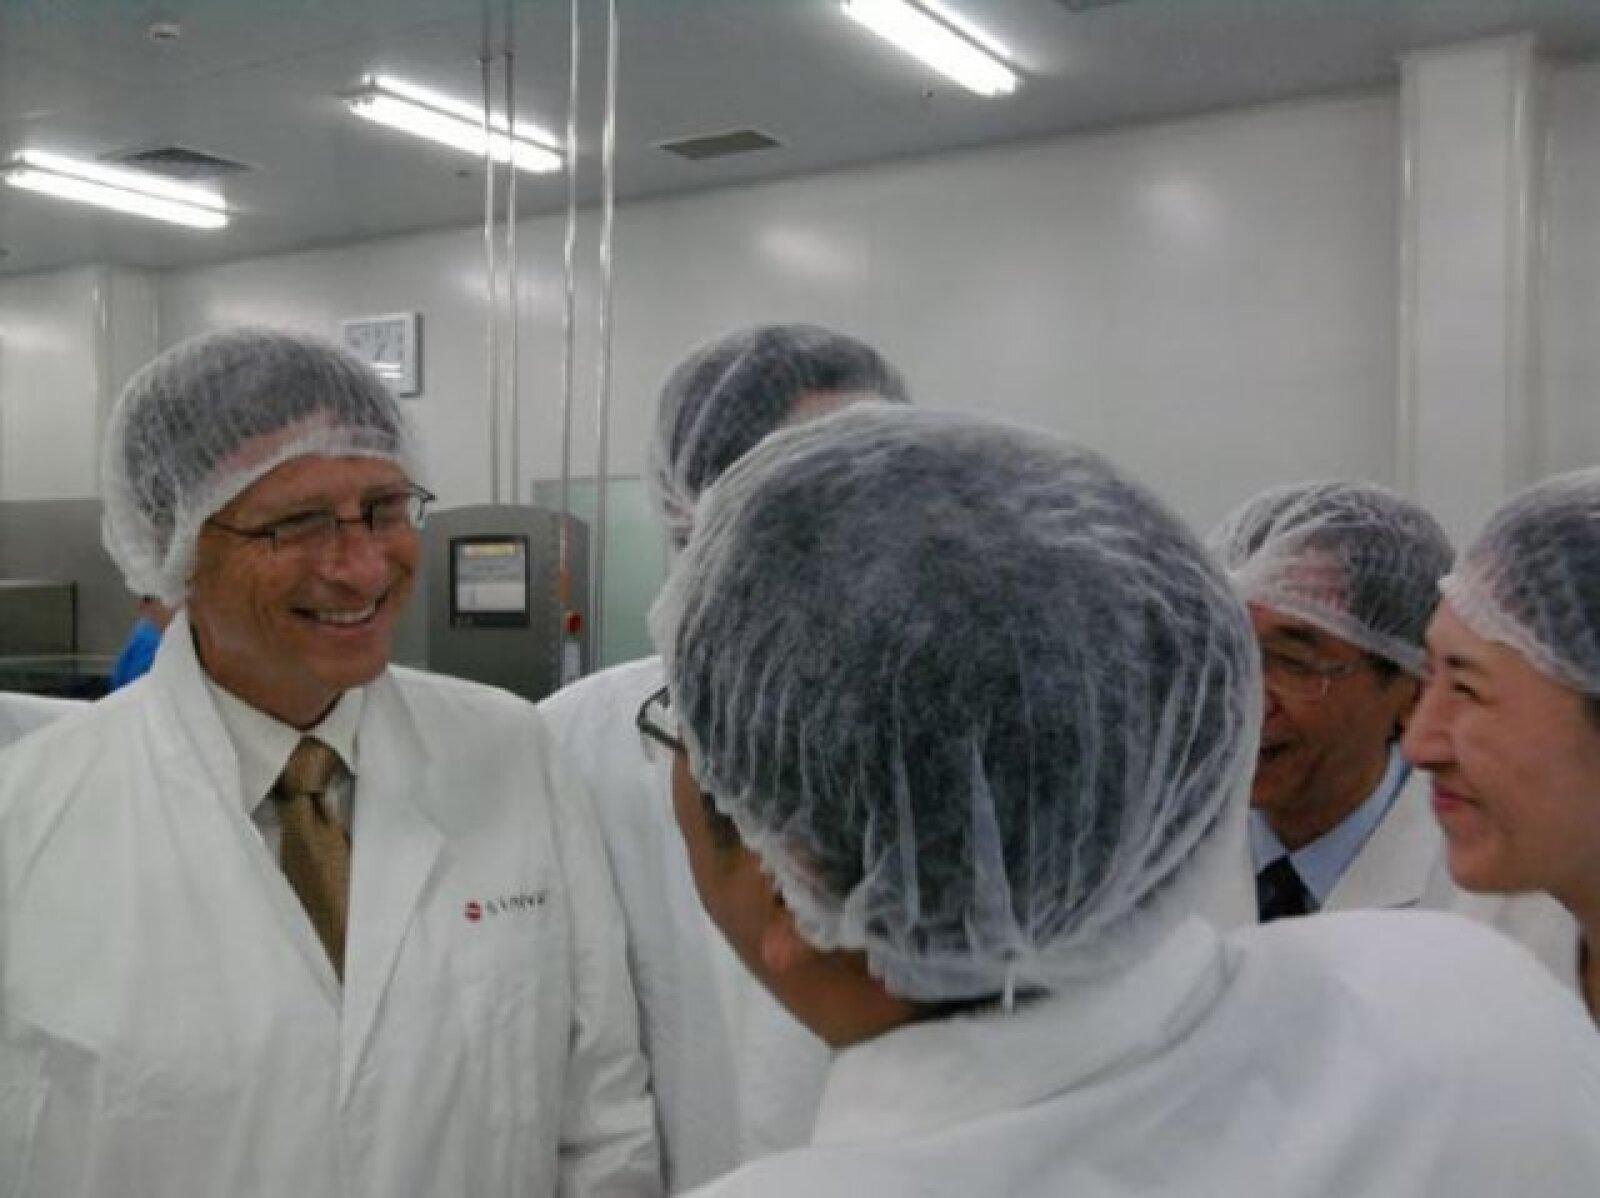 """Reunión con los científicos de Sinovac en Pekín"", escribió Bill Gates"